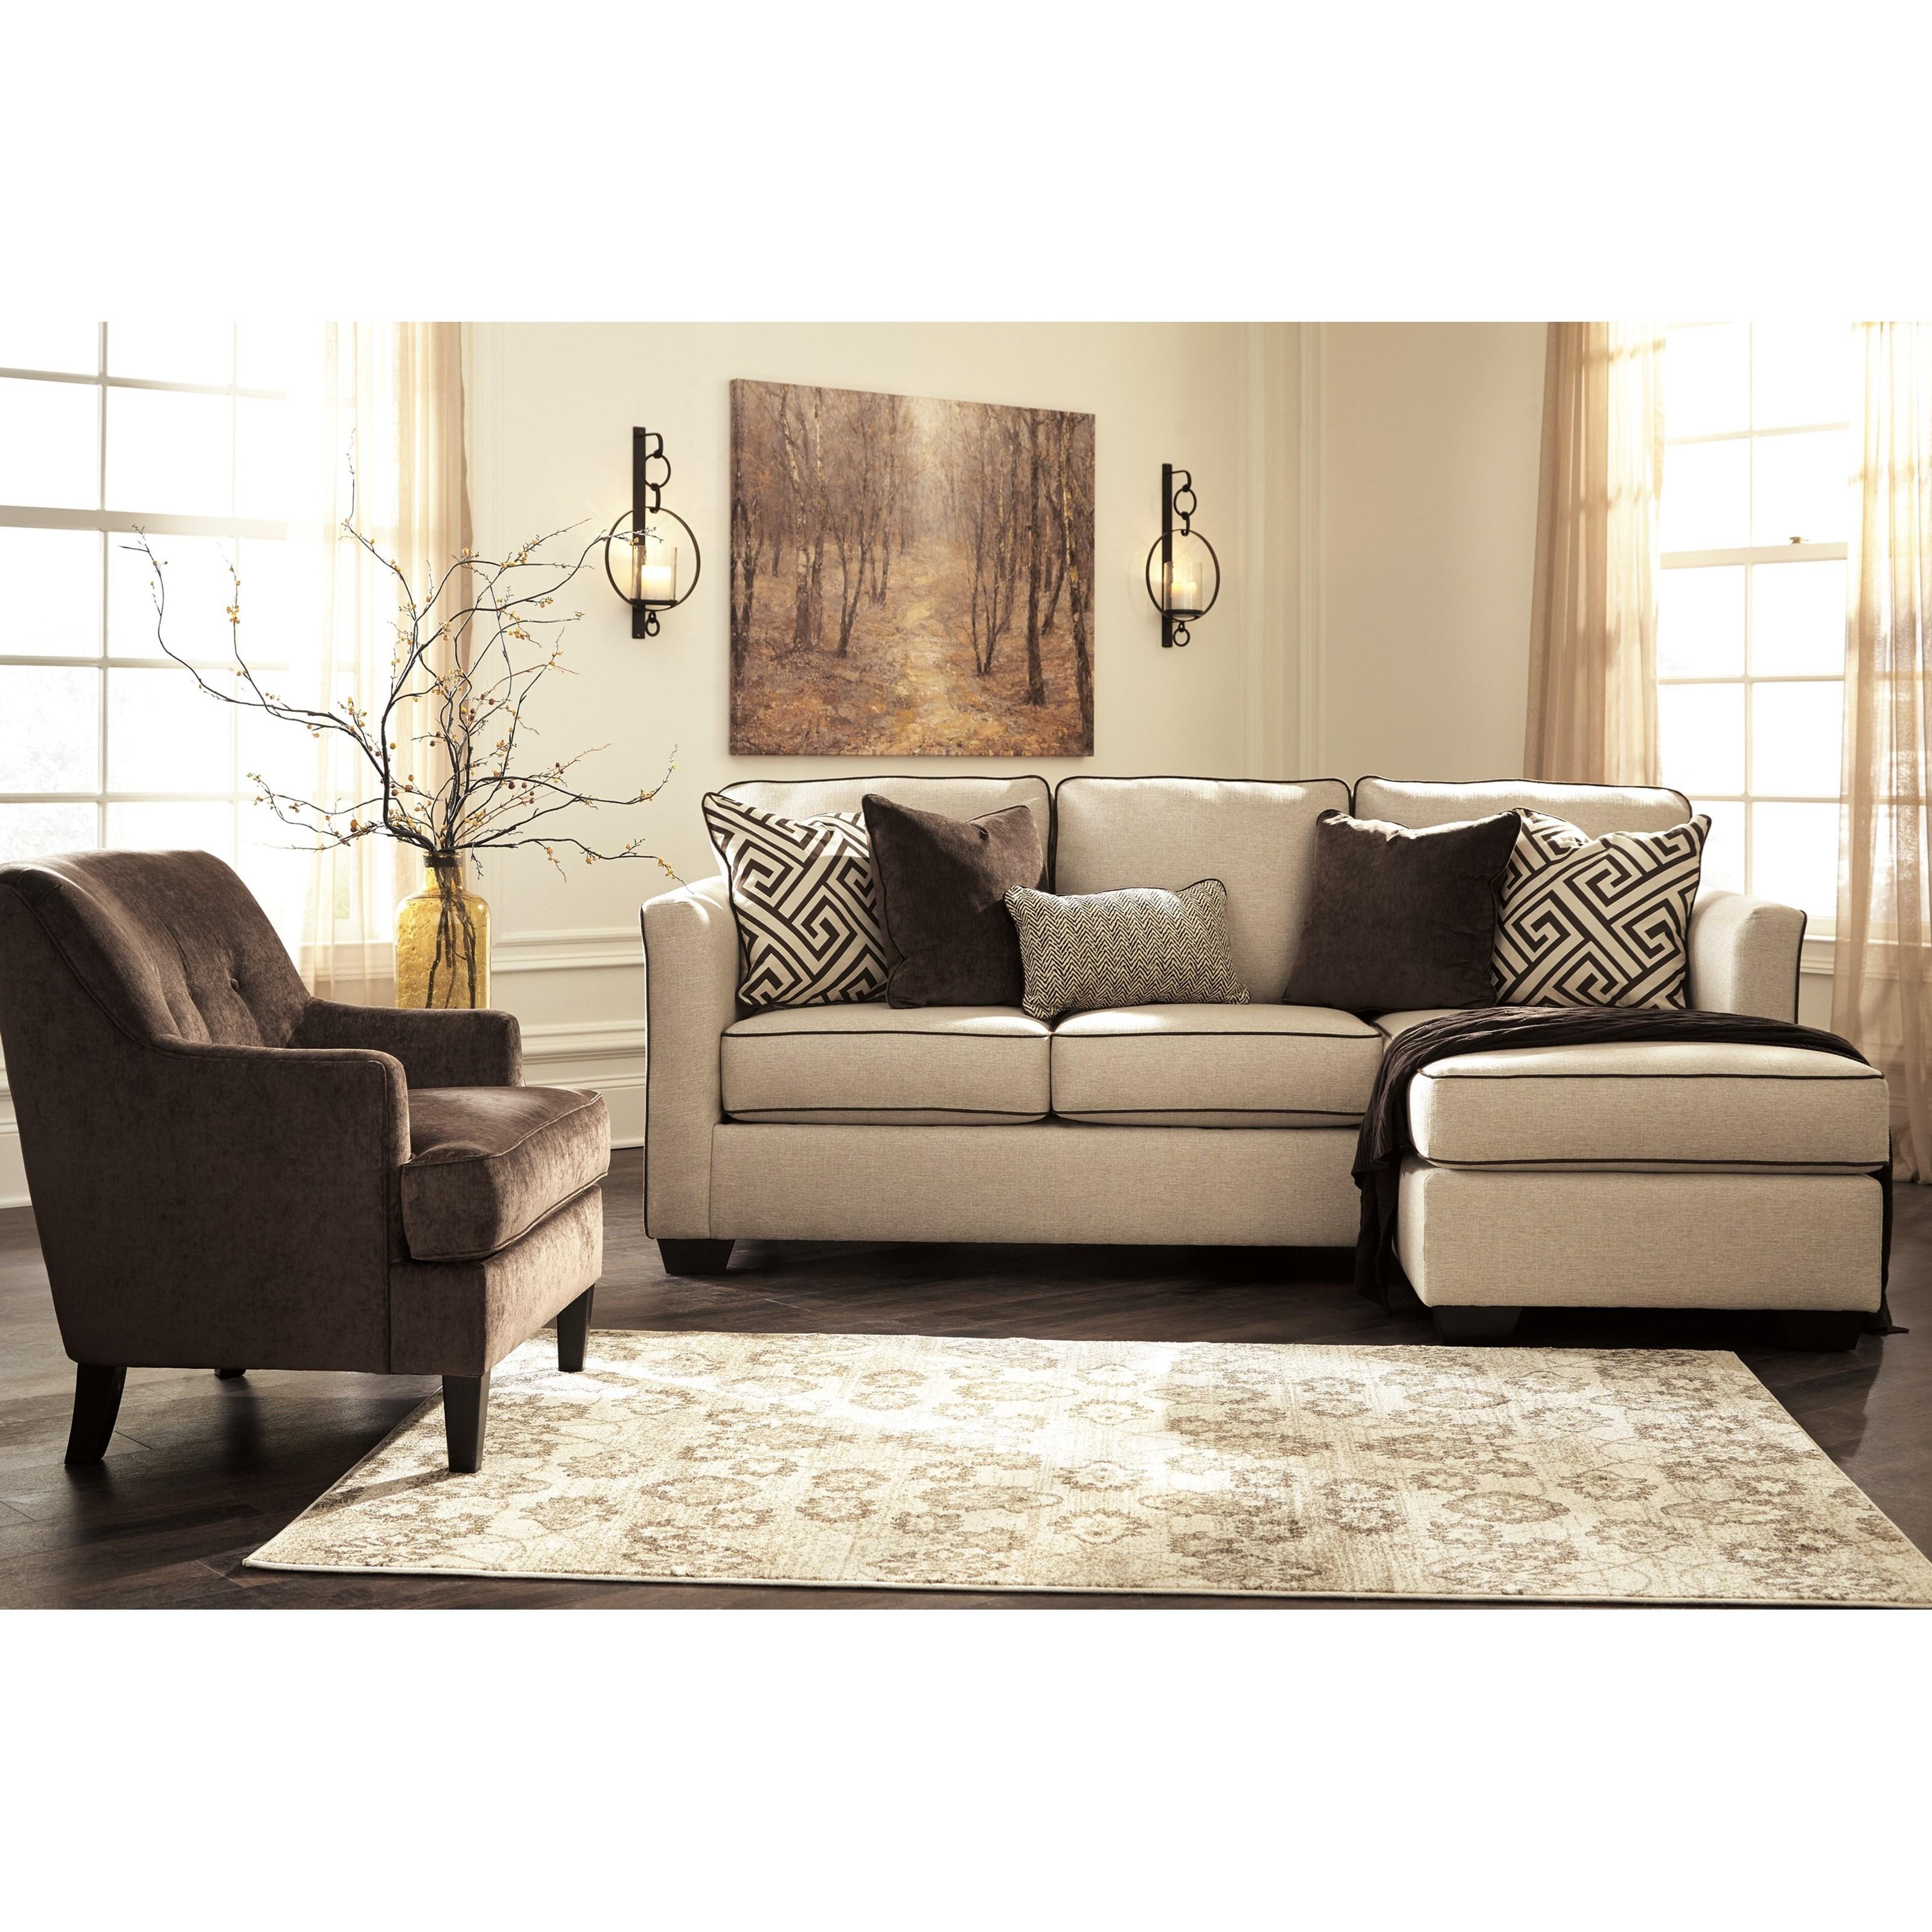 Benchcraft carlinworth stationary living room group for Living room furniture groups